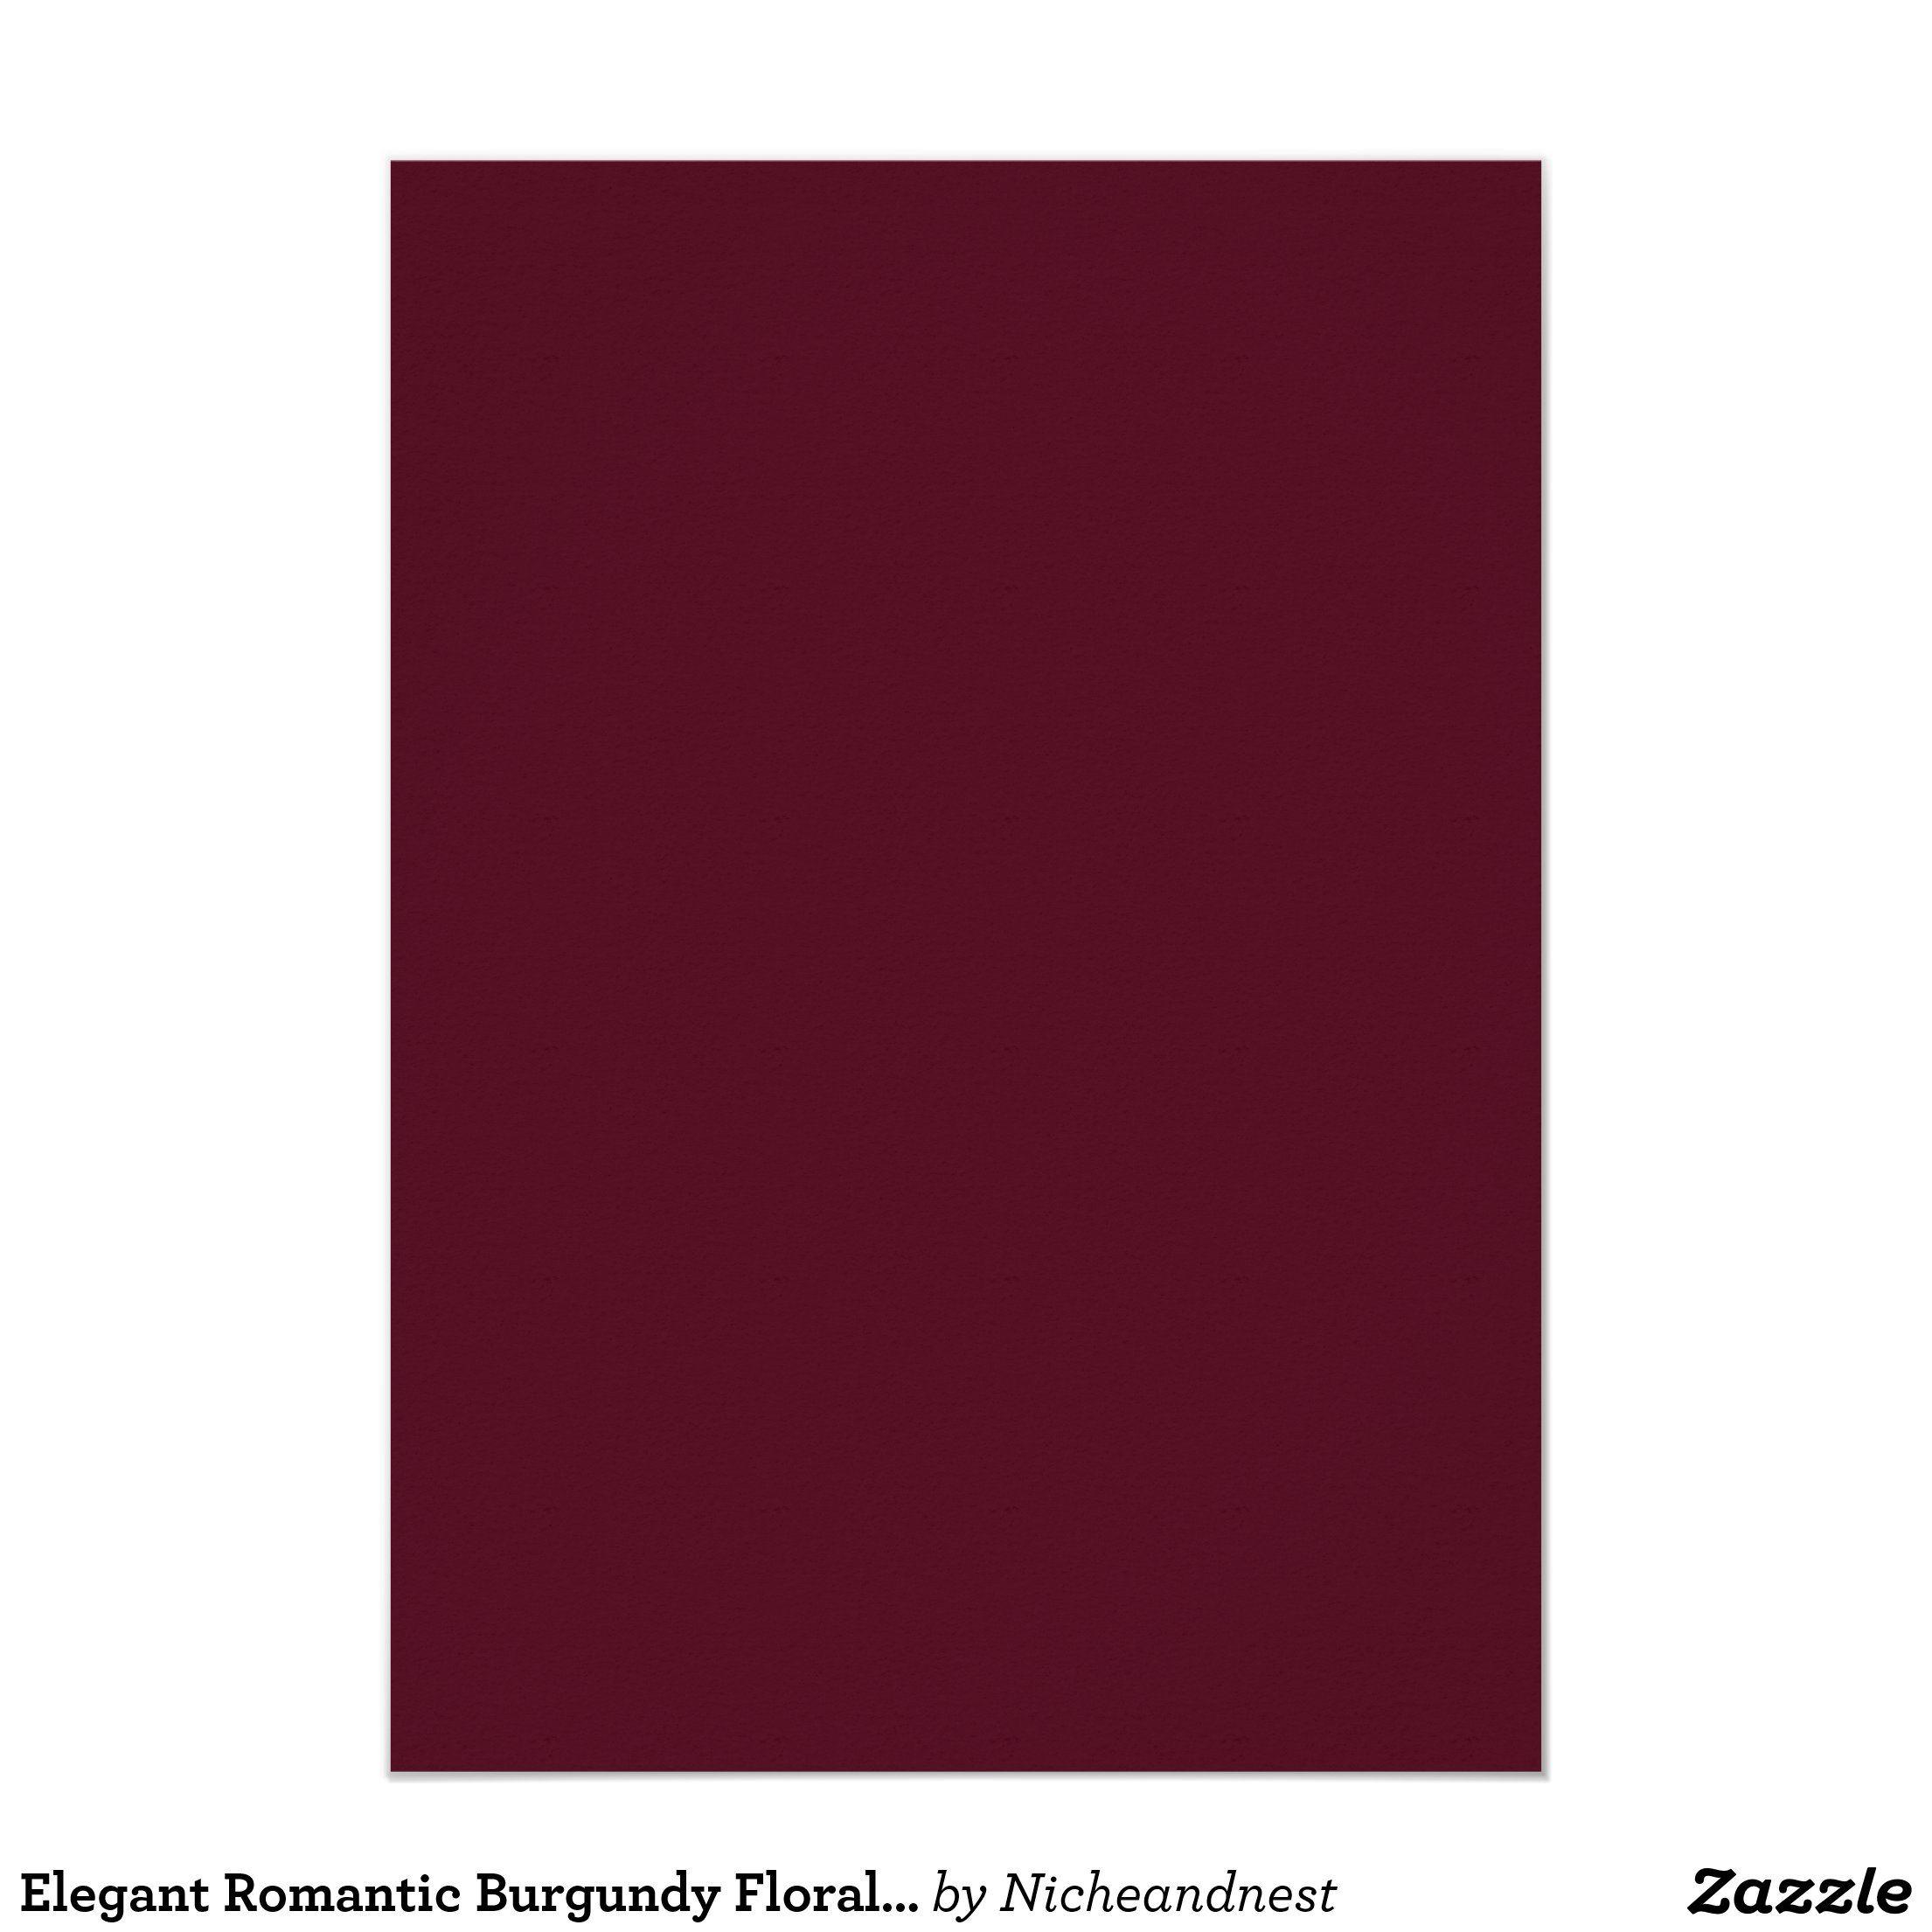 Elegant Romantic Burgundy Floral Wedding Invite Zazzle Com In 2020 Burgundy Paint Red Paint Colors Spring Wedding Invitations